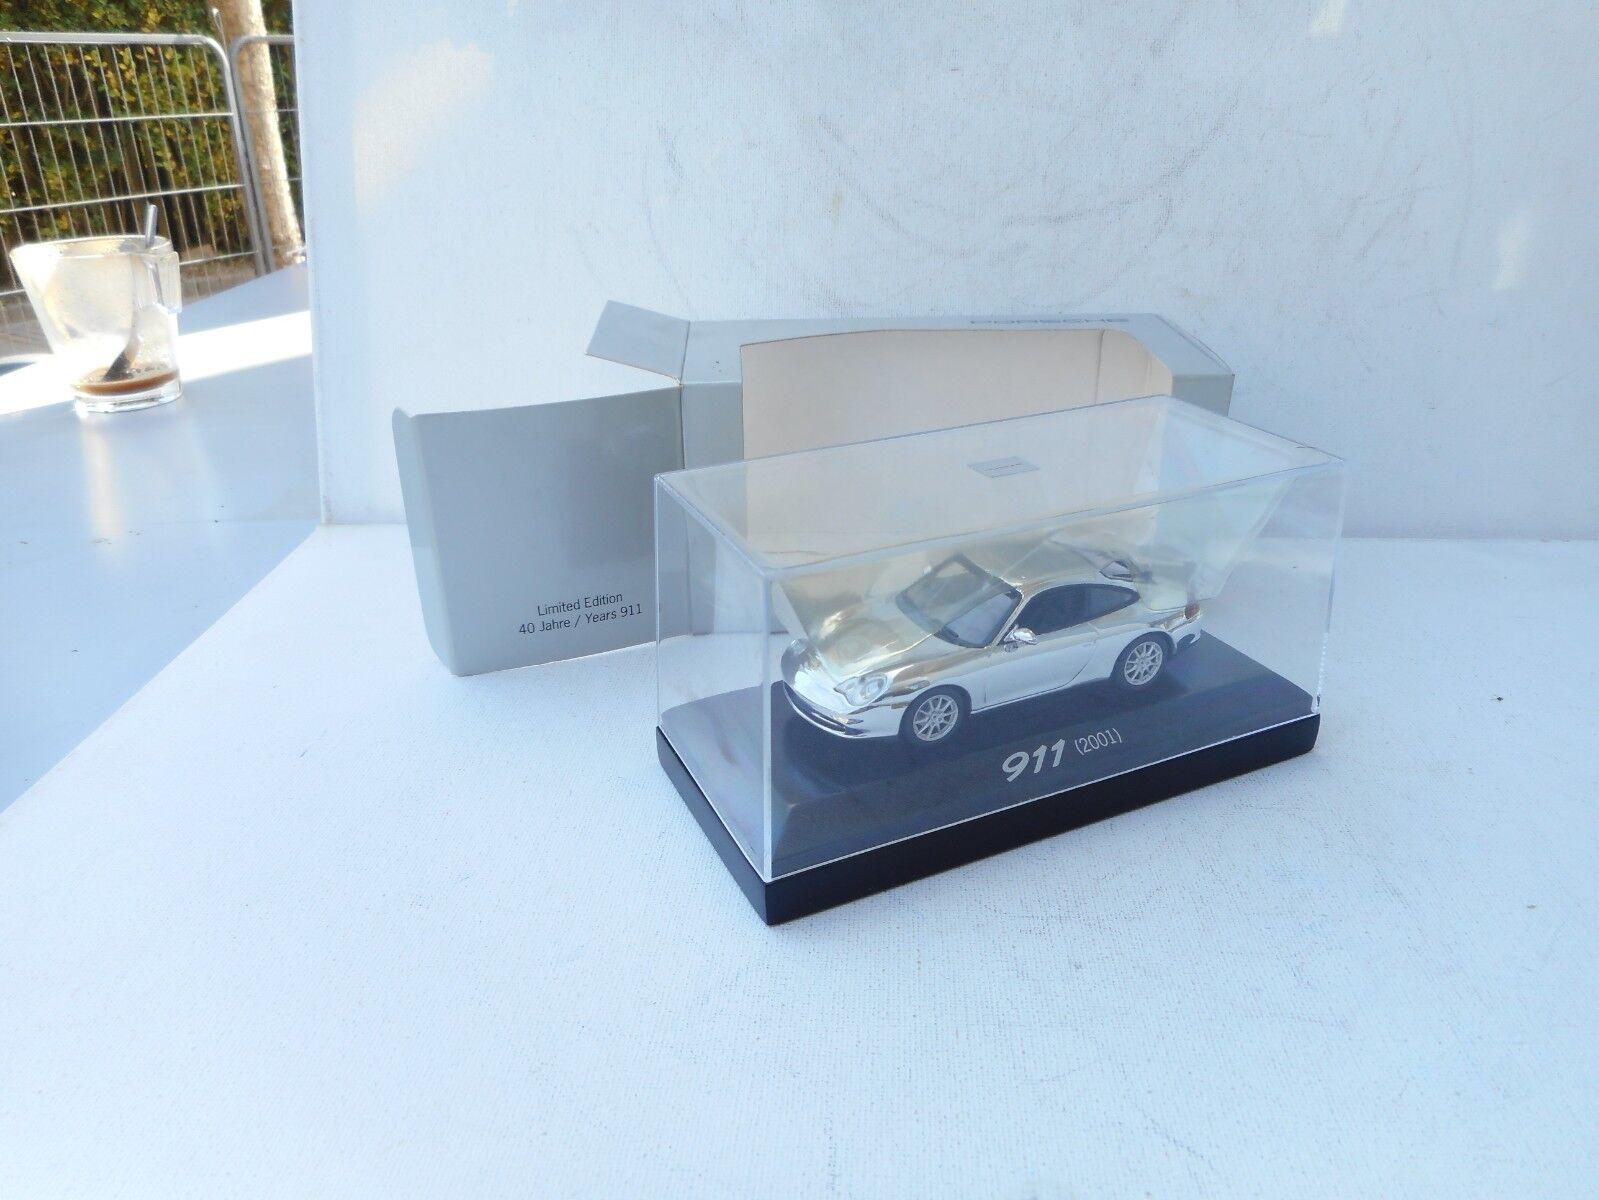 Rare Porsche Dealer 911 Coupe from 2001 in Chrome. Minichamps 1 43 Diecast NEW